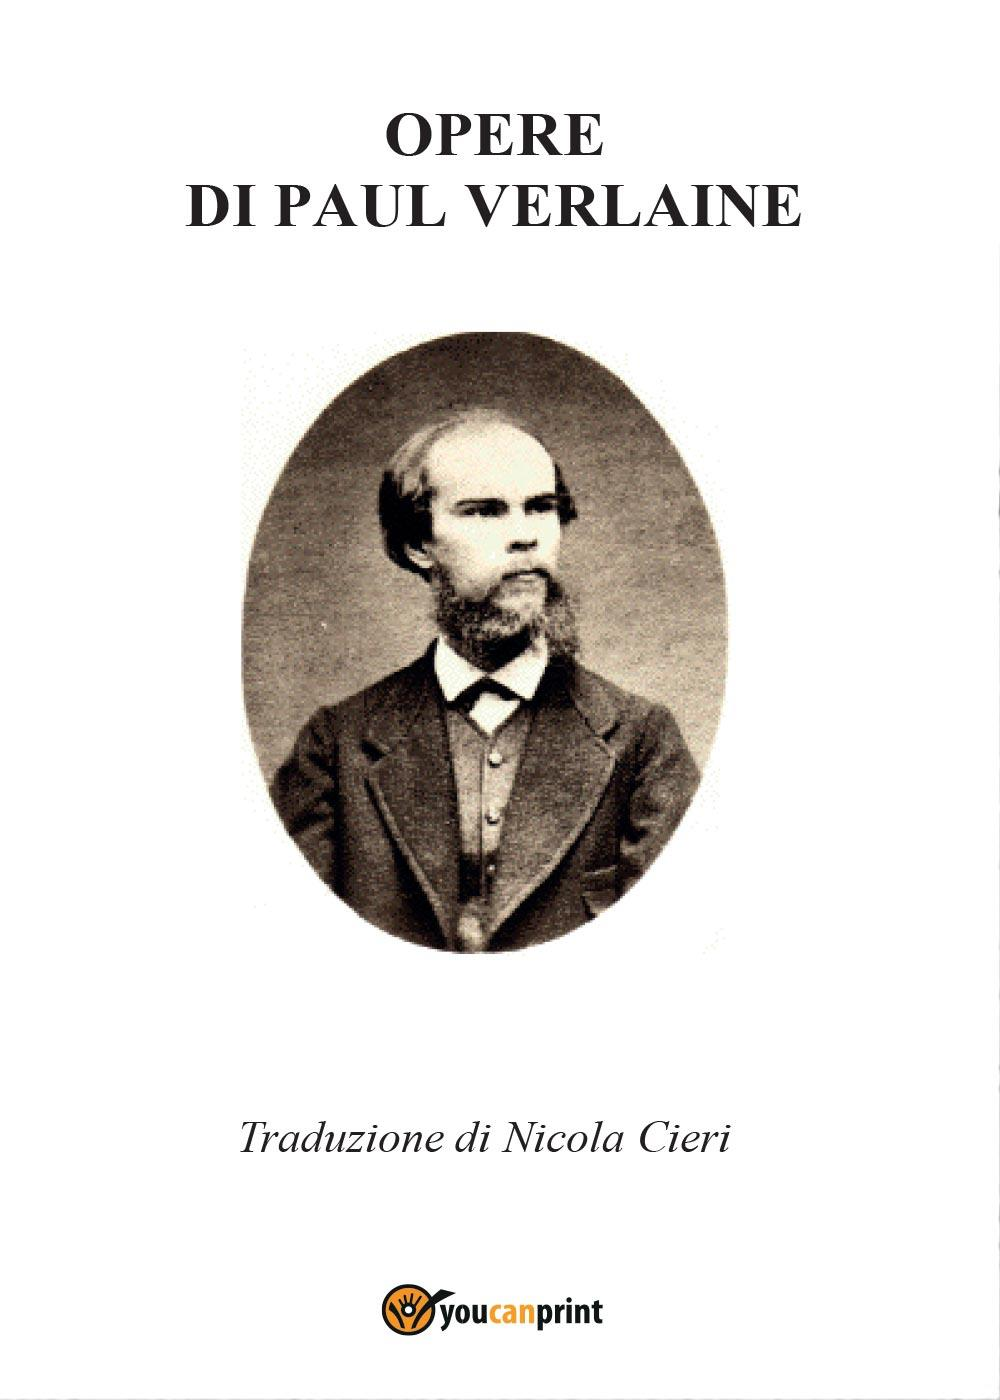 Opere di Paul Verlaine - Amore, Parallelamente, Felicità